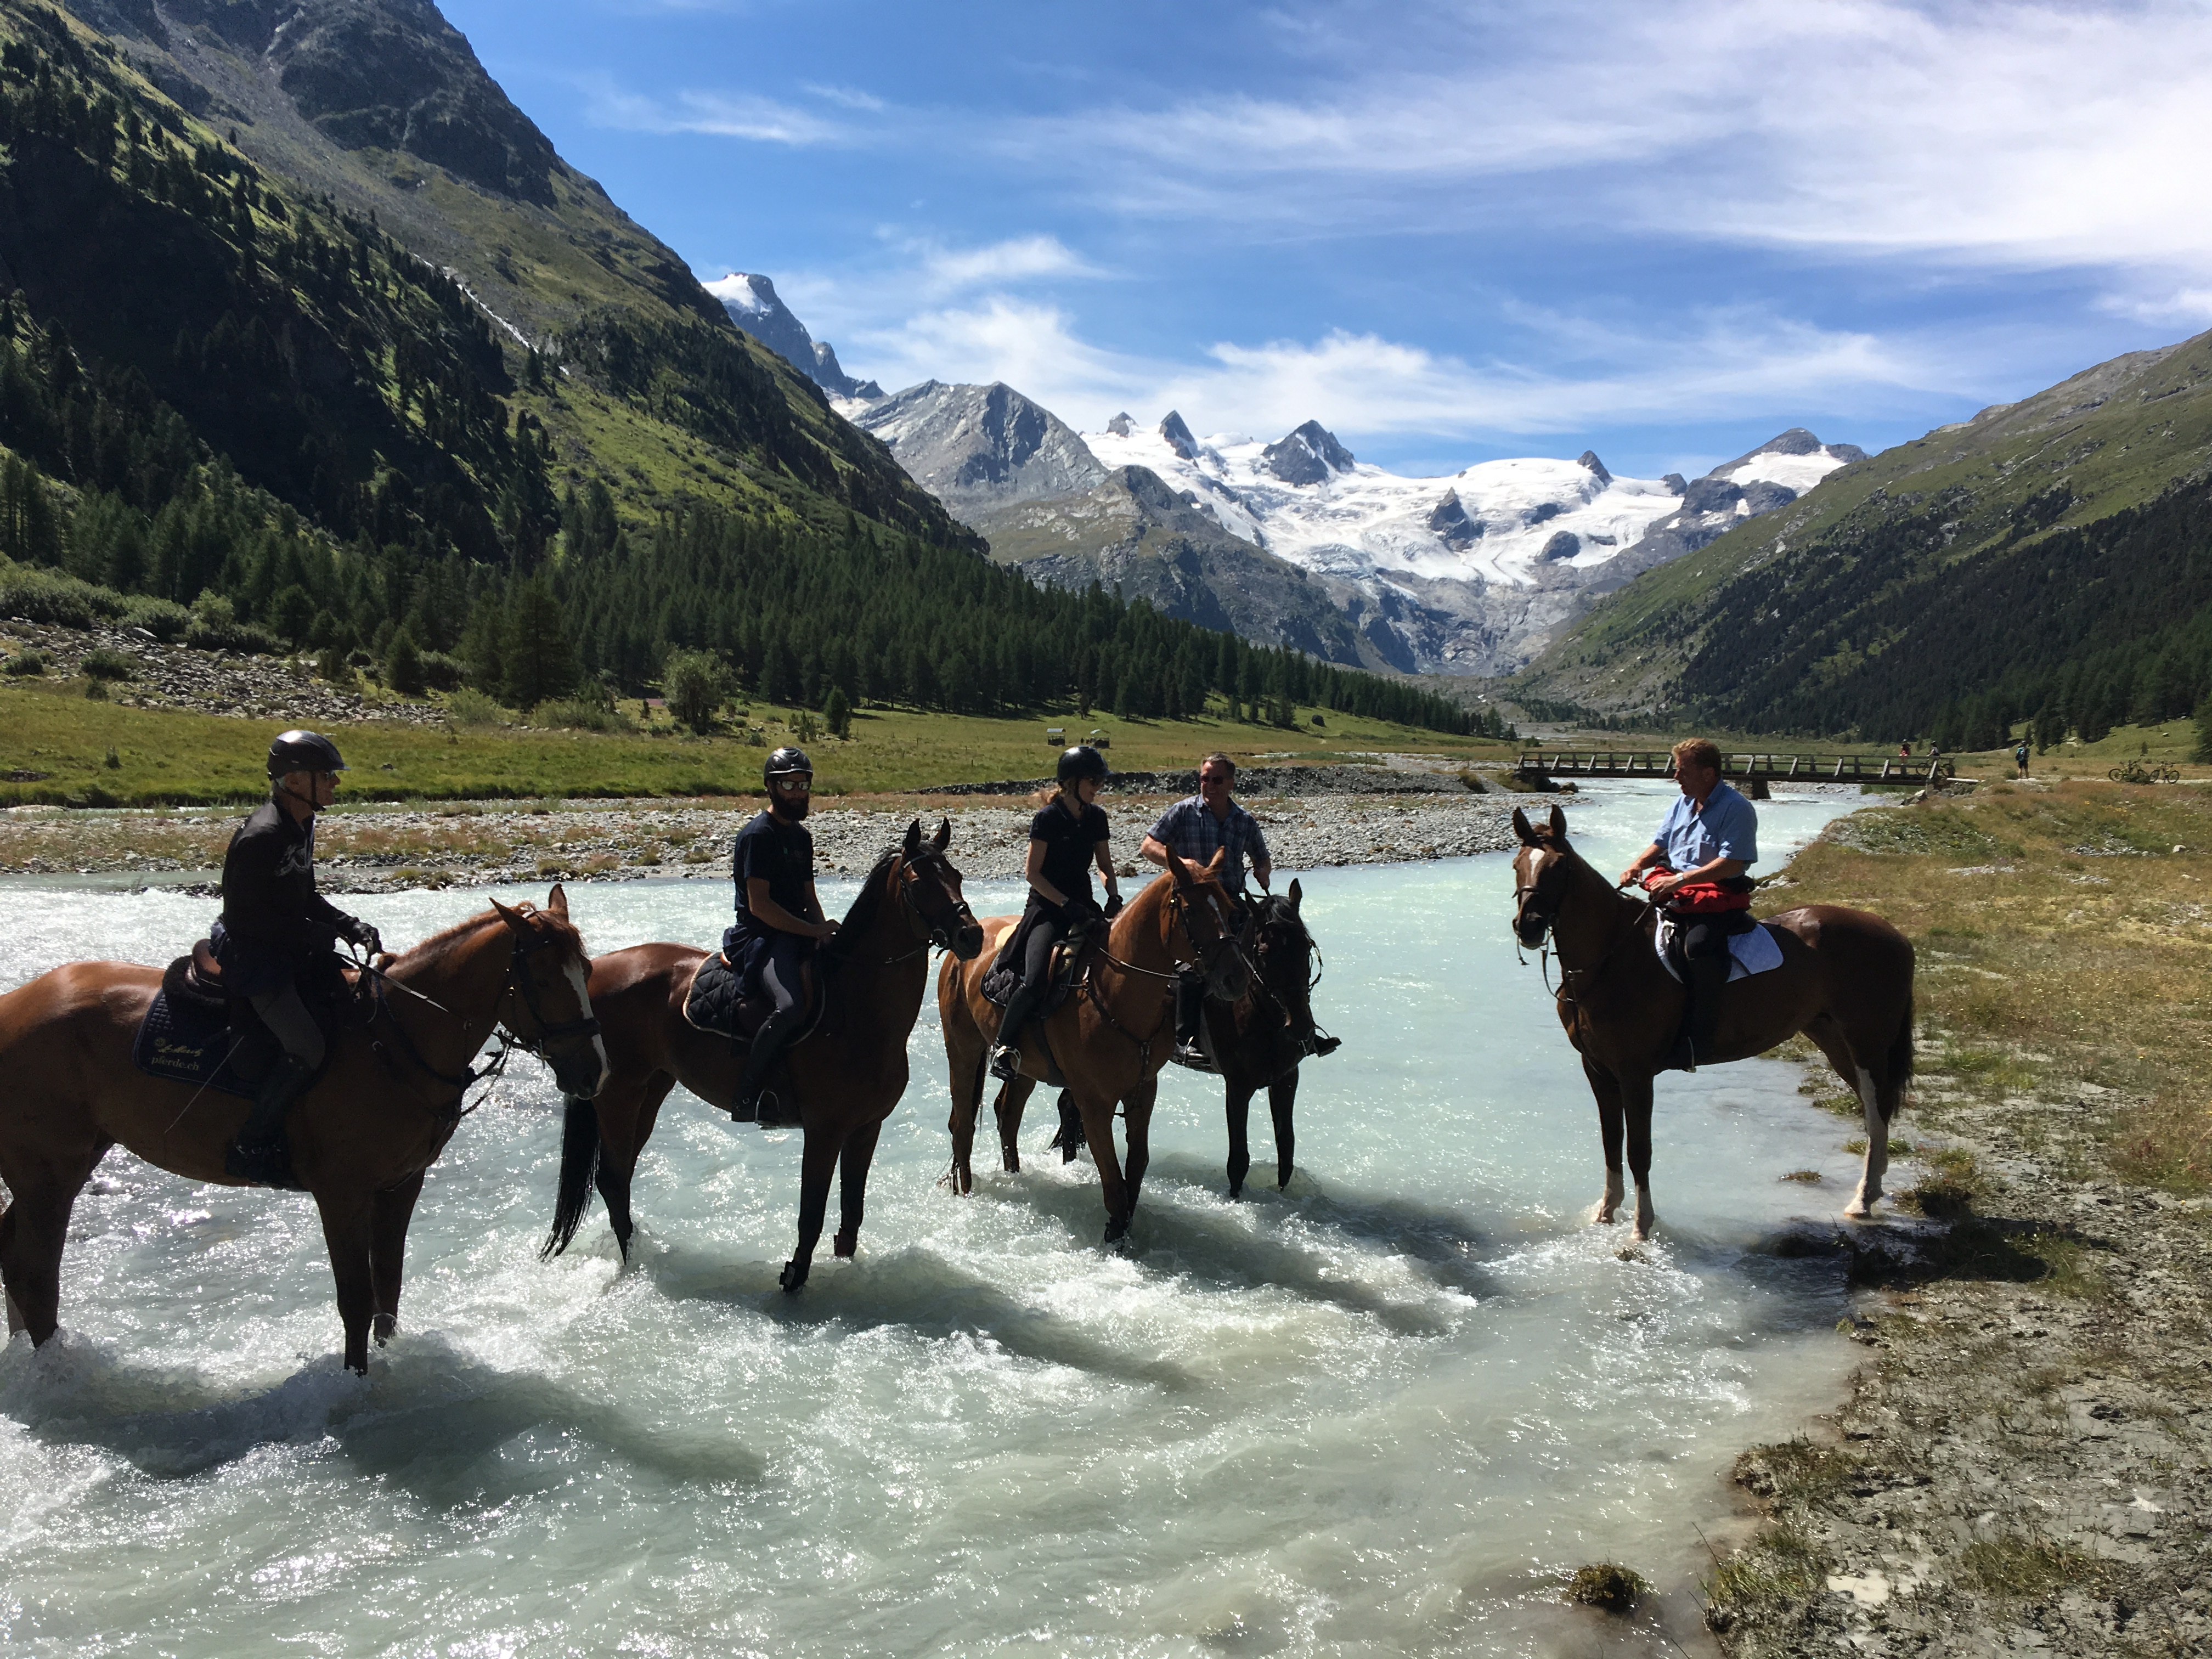 Pferdepension / Ferienpferderesidenz Slide 1